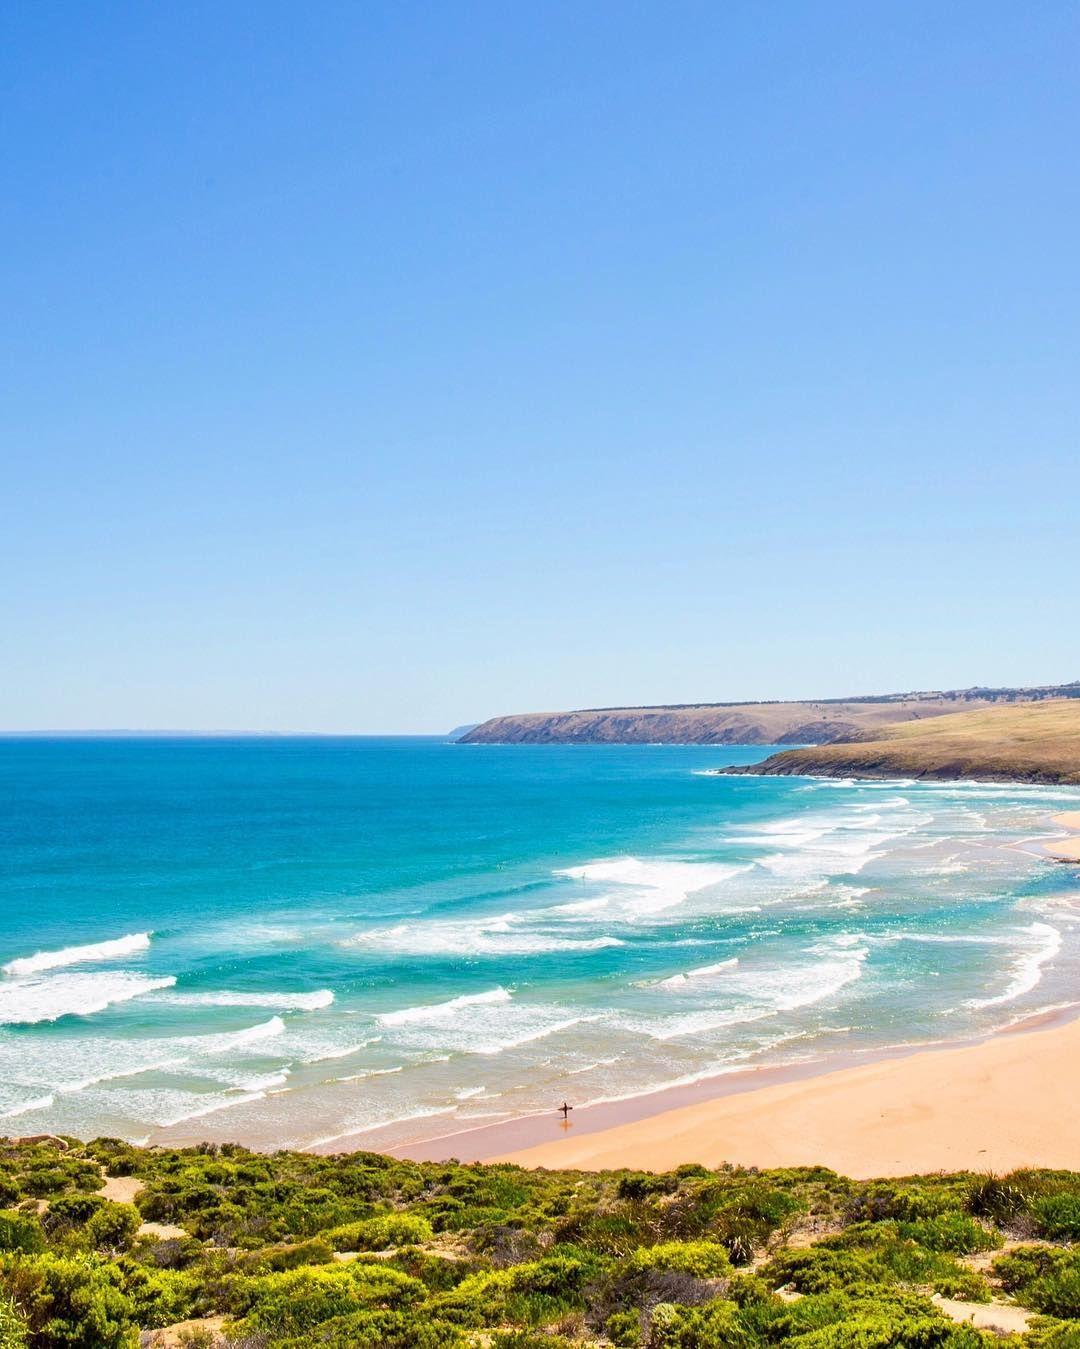 Kangaroo Island Beaches: Parsons Beach. South Australia.